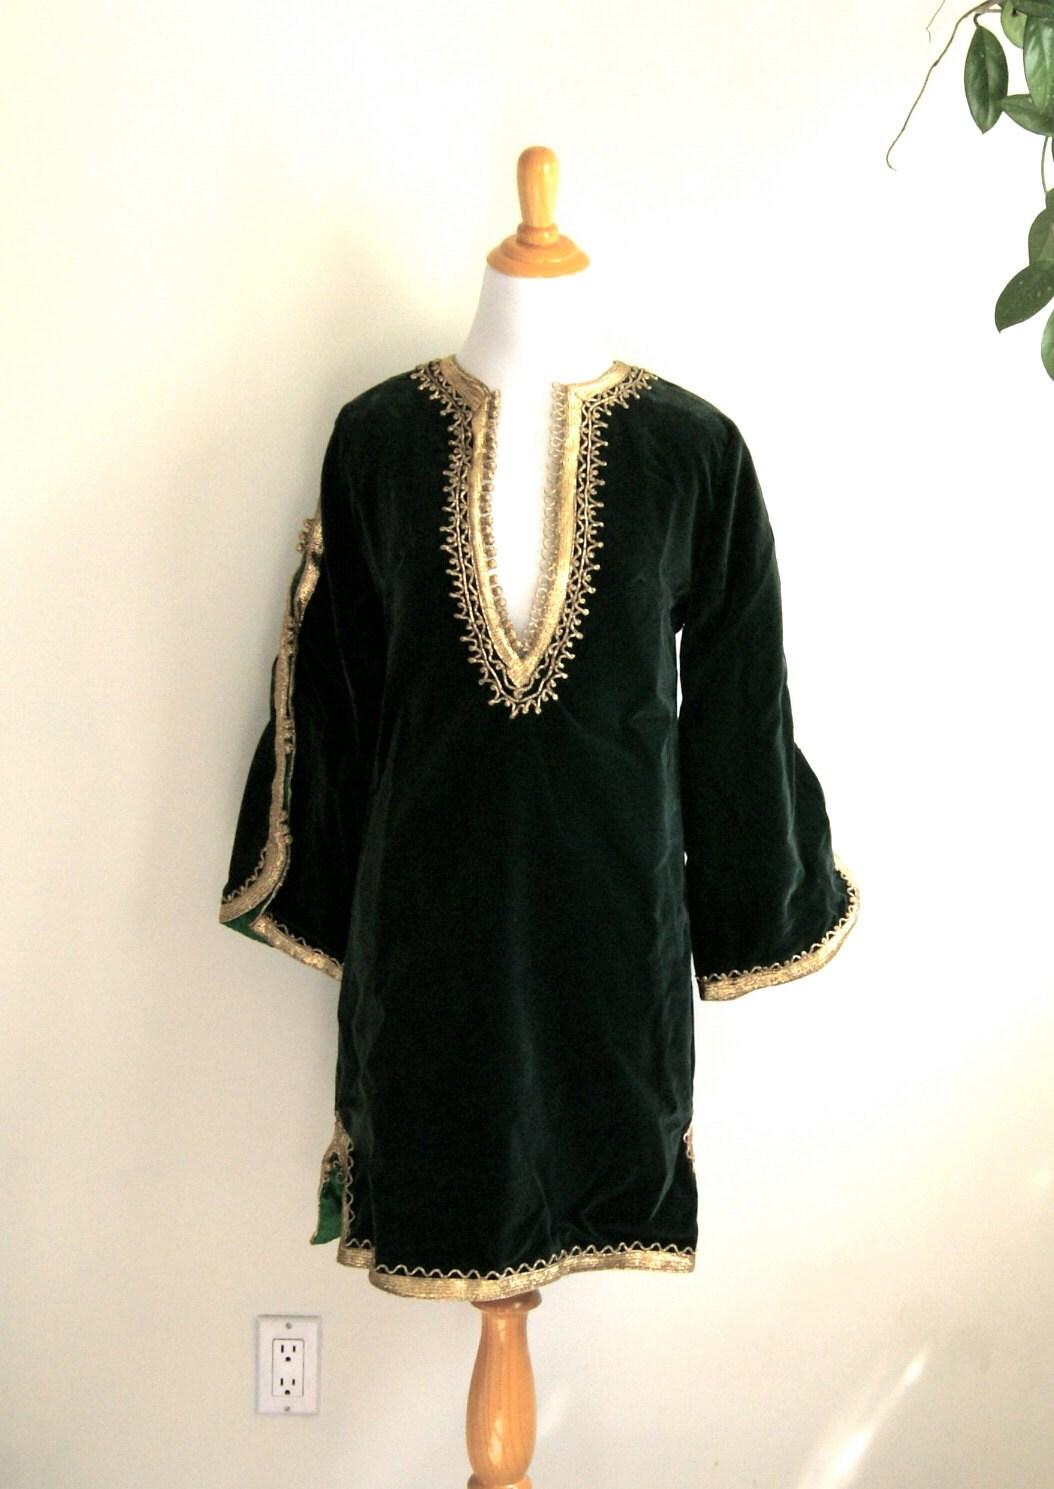 Emerald Green Velvet Tunic Dress With Metallic Gold Trim